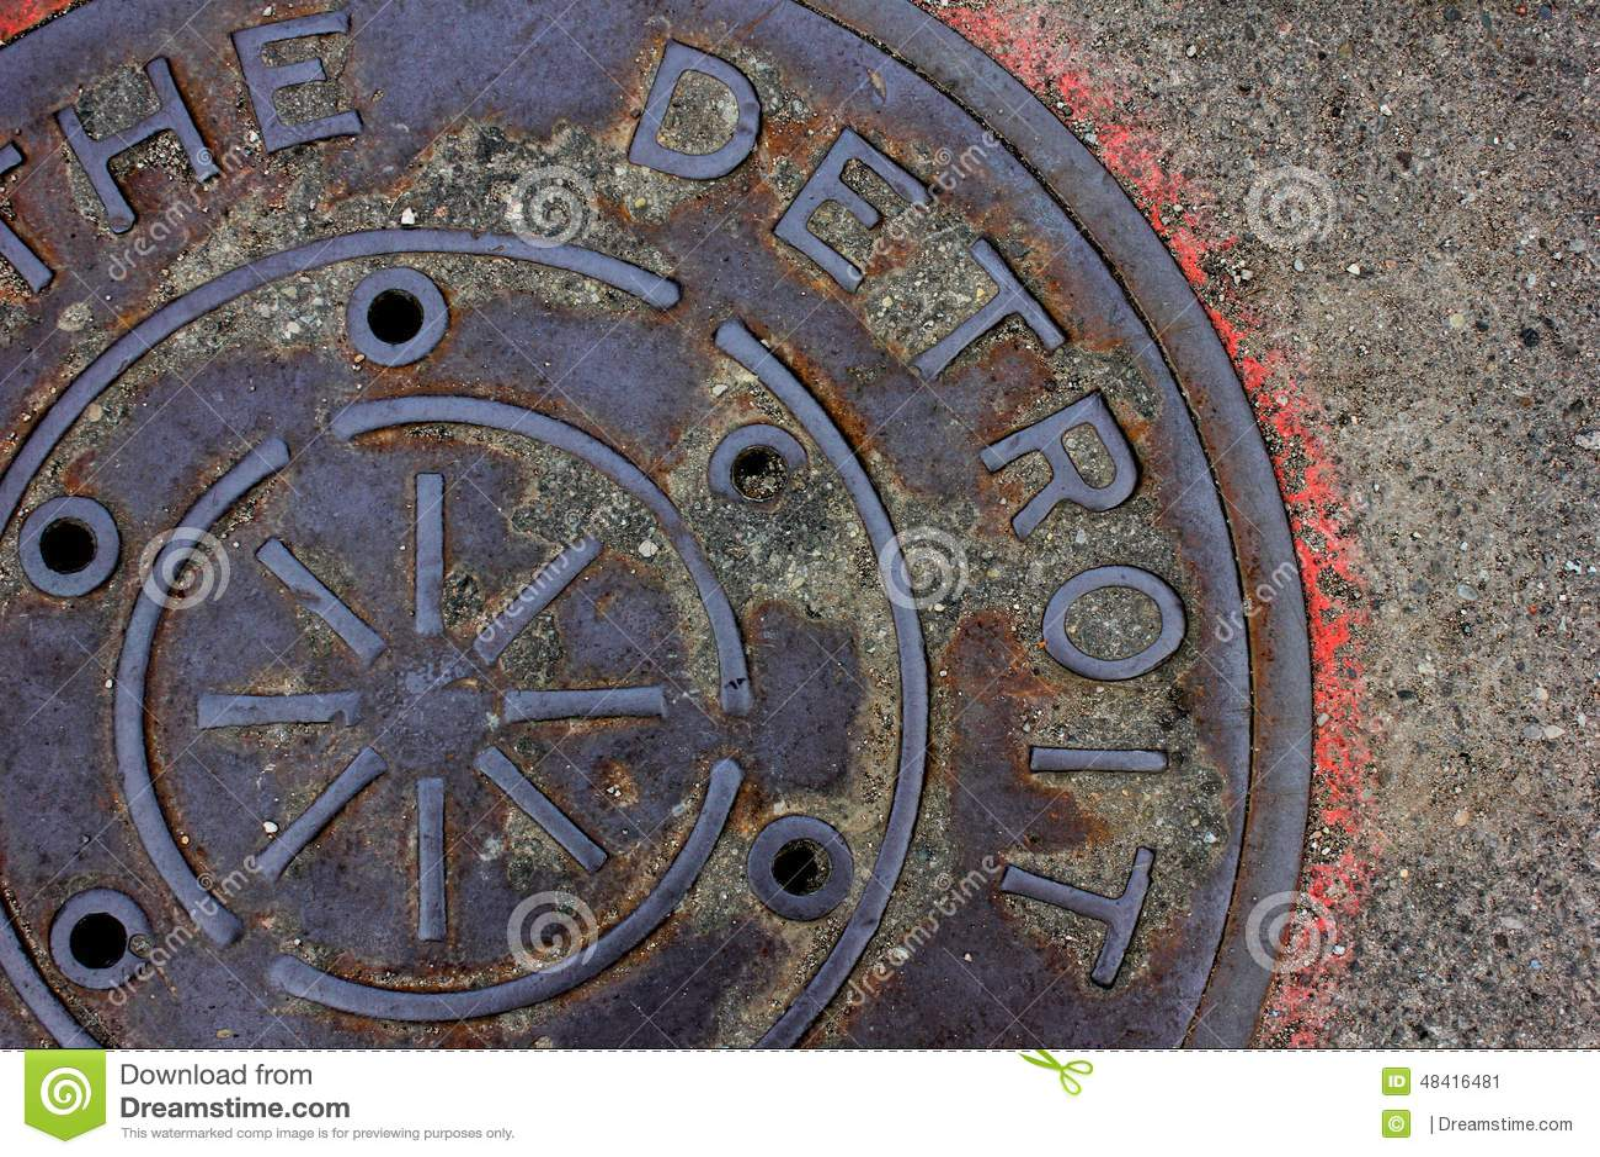 Detroit manhole